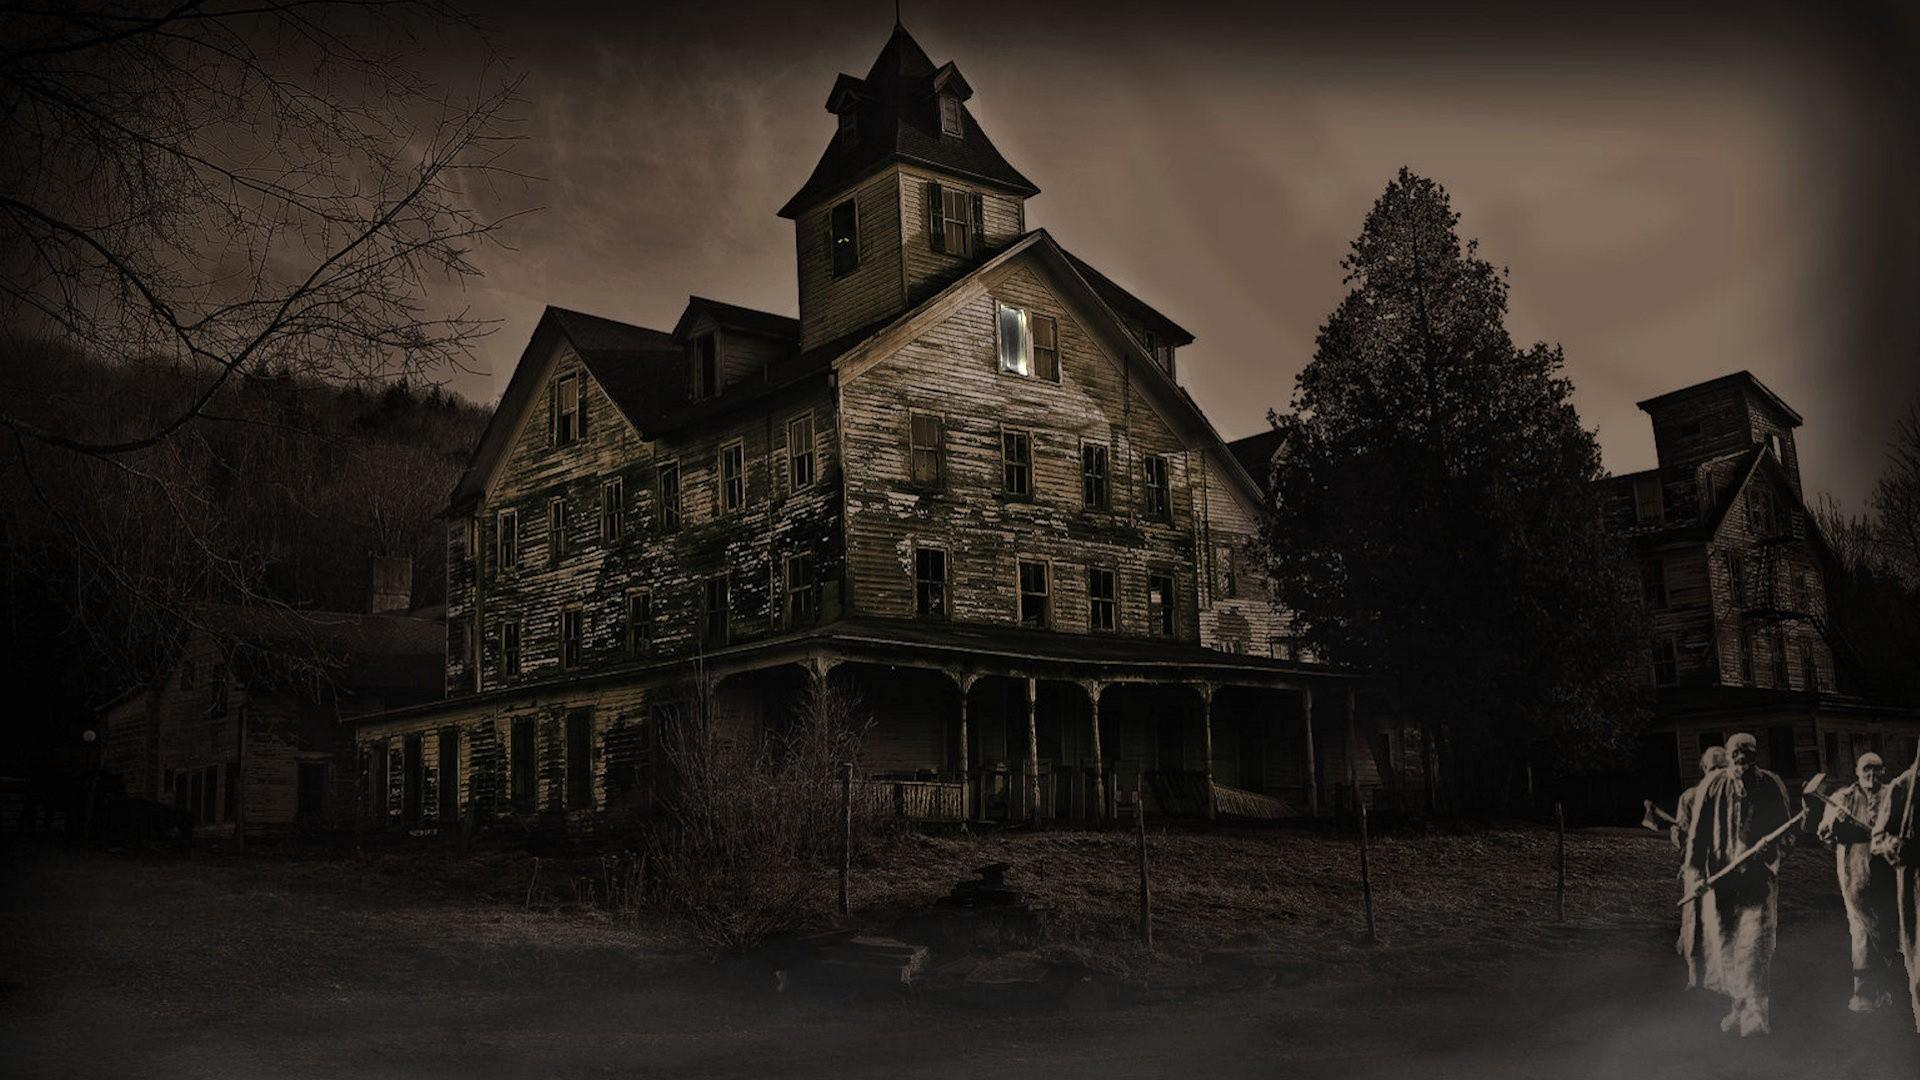 Best Wallpaper Halloween Haunted - 117501-widescreen-haunted-one-background-1920x1080-download-free  Photograph_573121.jpg